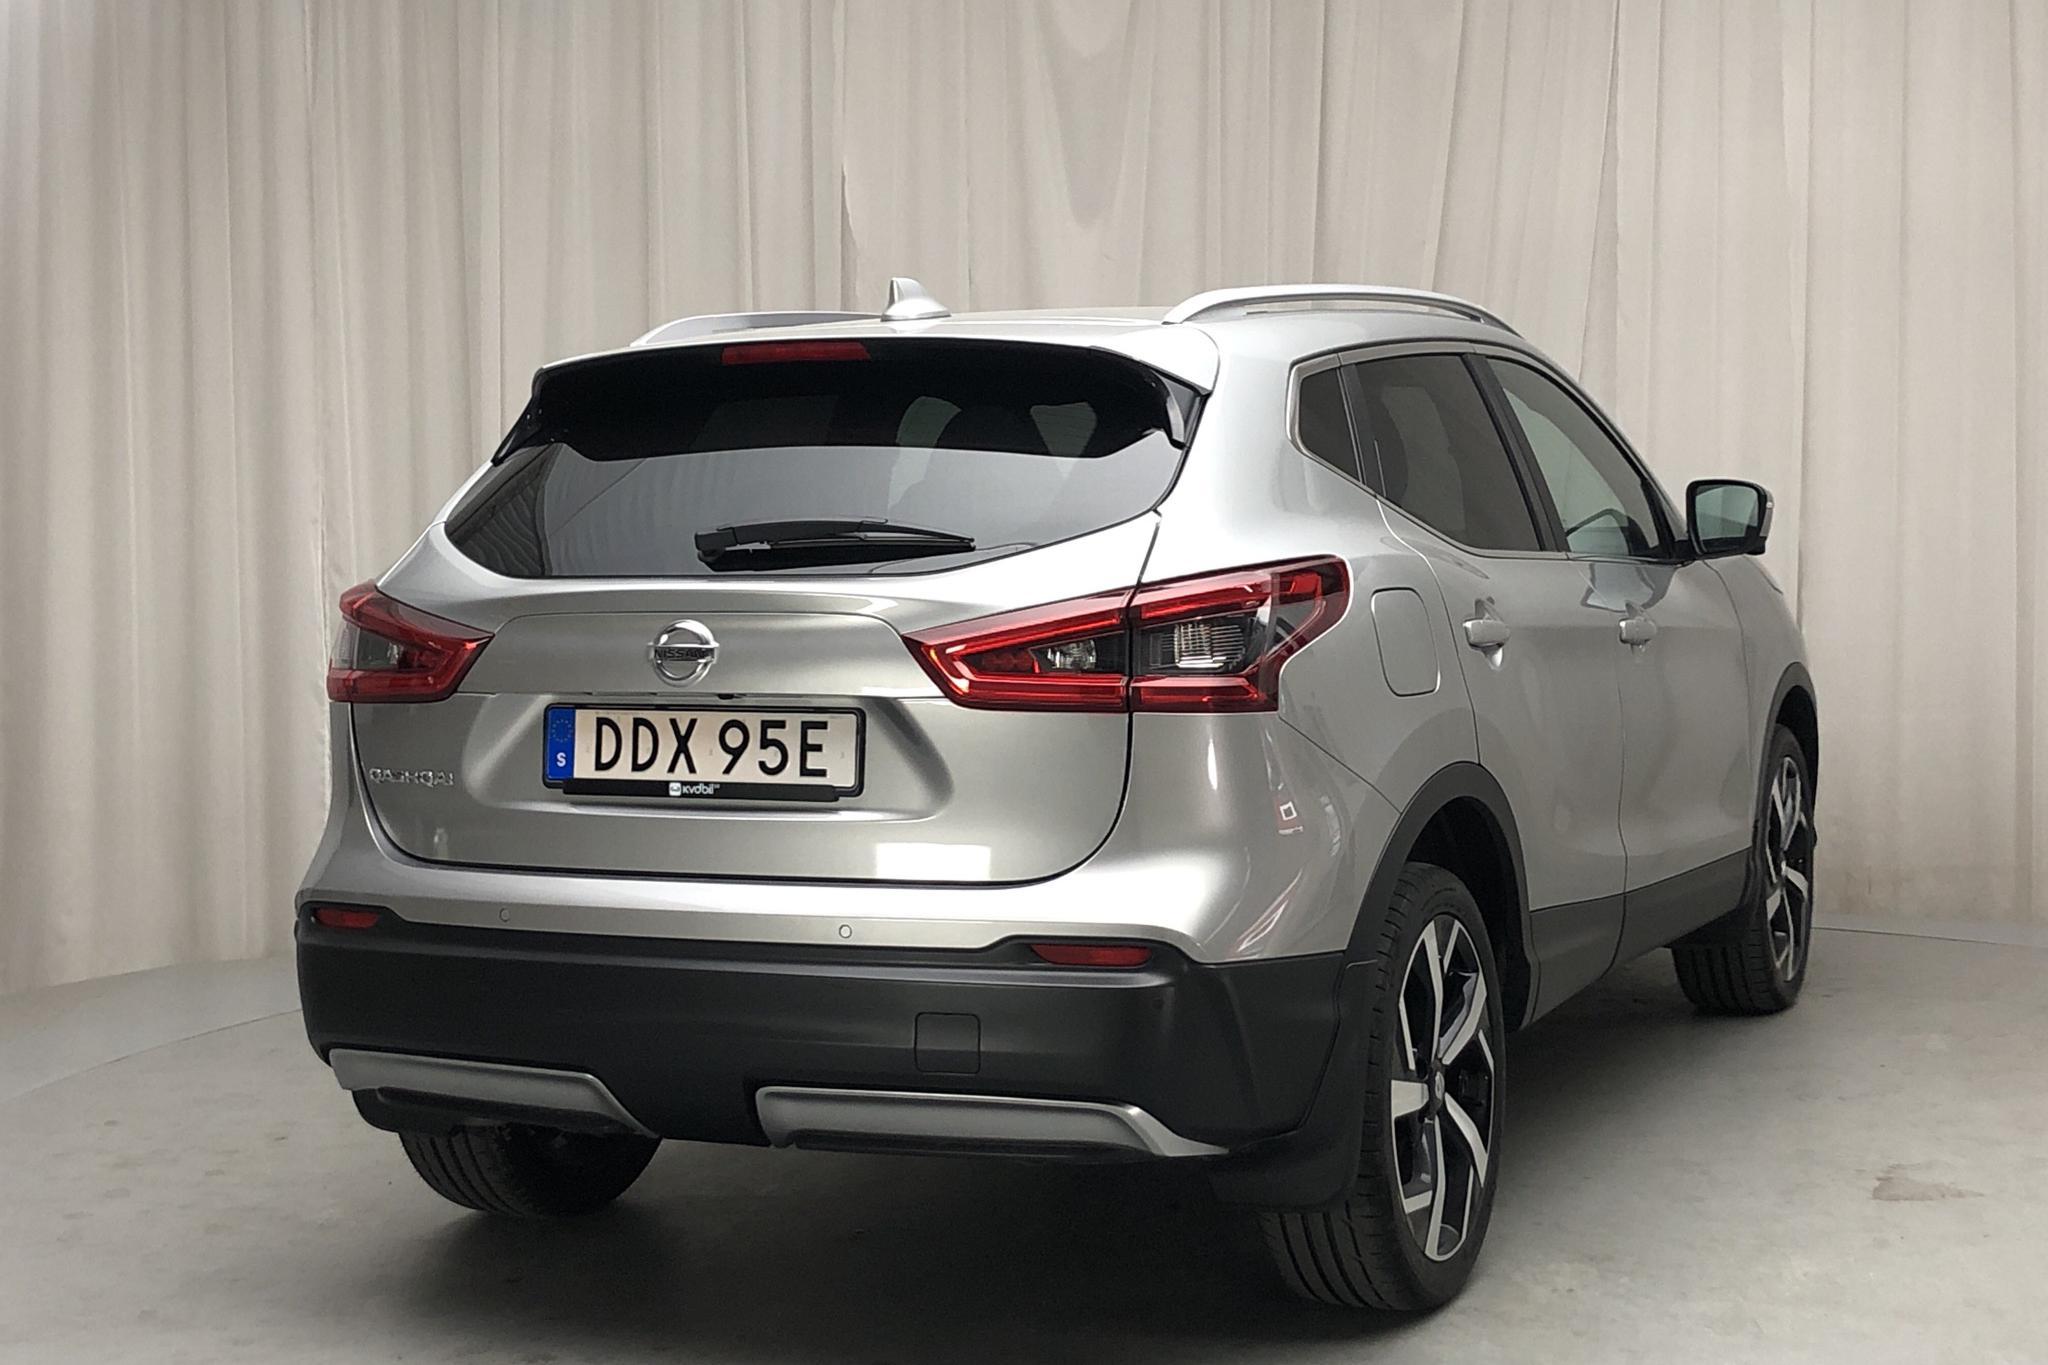 Nissan Qashqai 1.3 DIG-T (140hk) - 13 720 km - Manual - silver - 2019